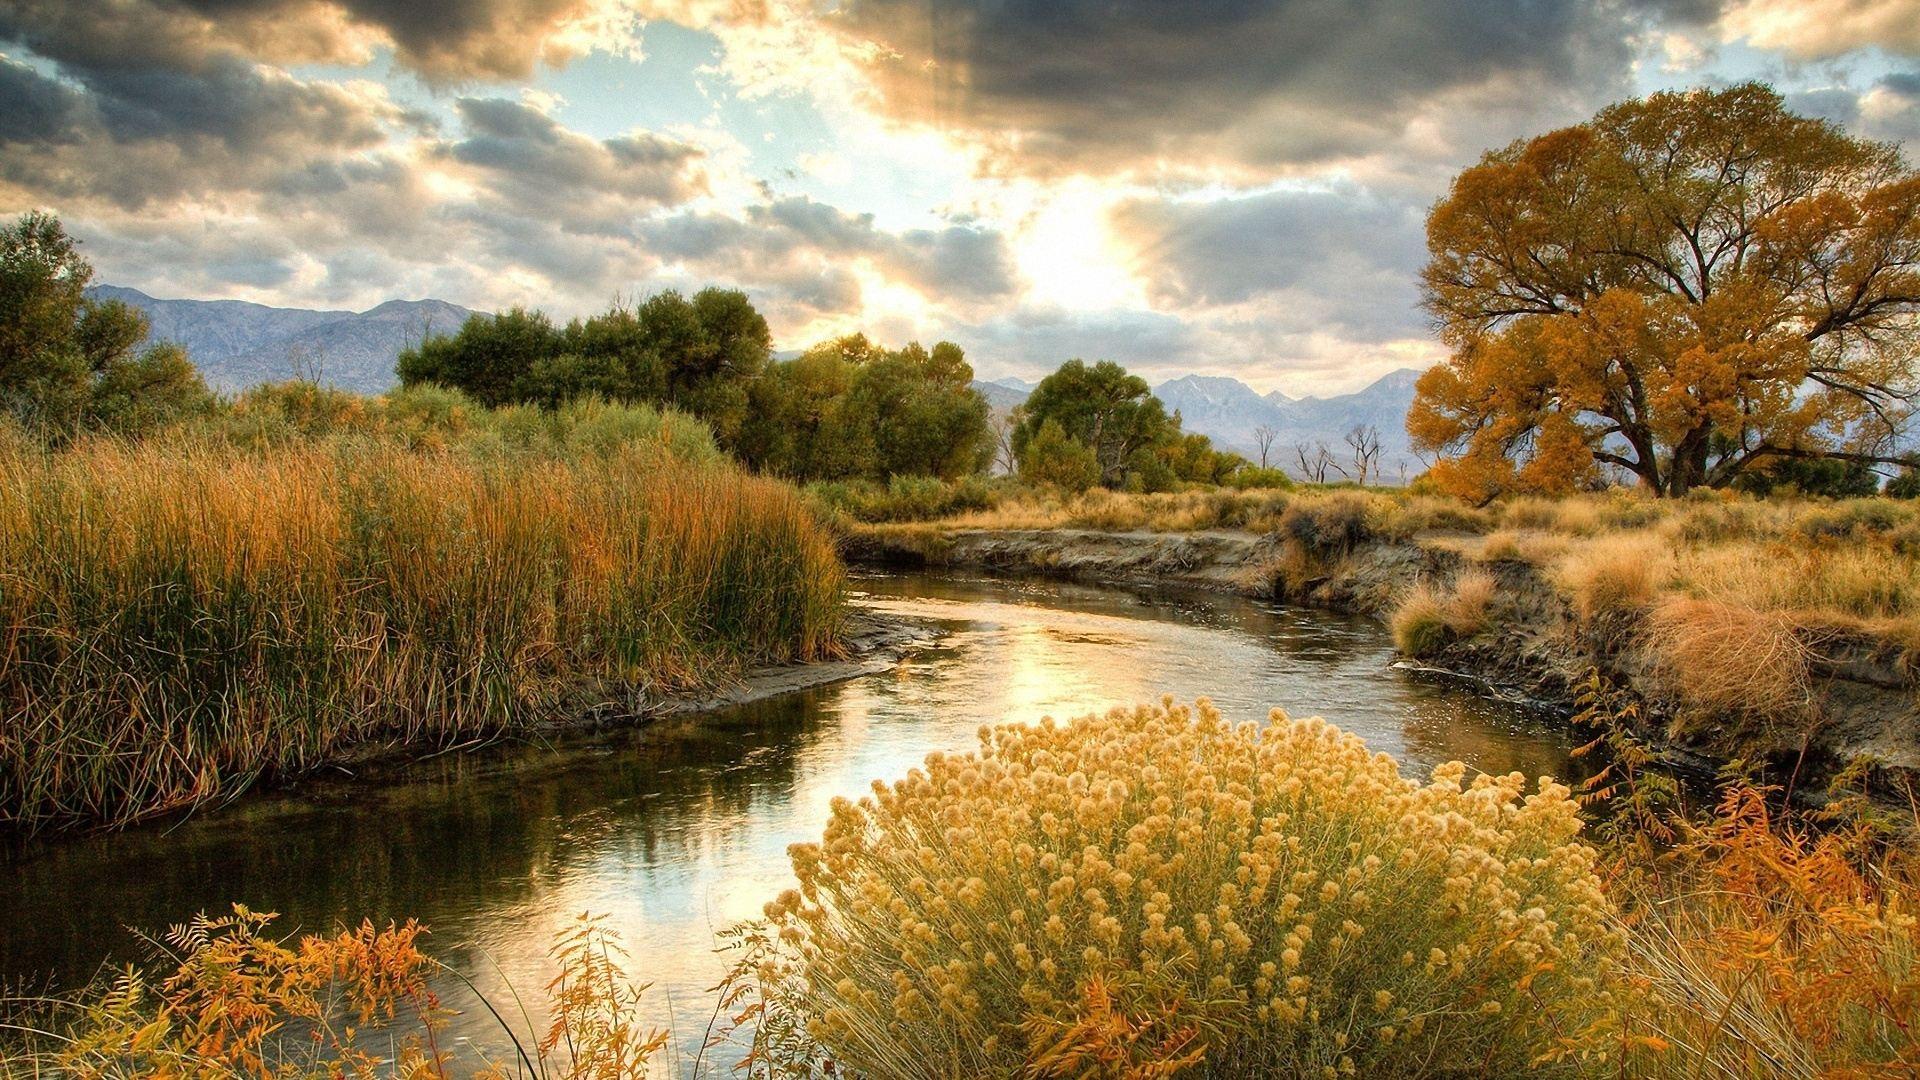 48 autumn hd wallpapers 1080p on wallpapersafari - Hd photos of scenery ...